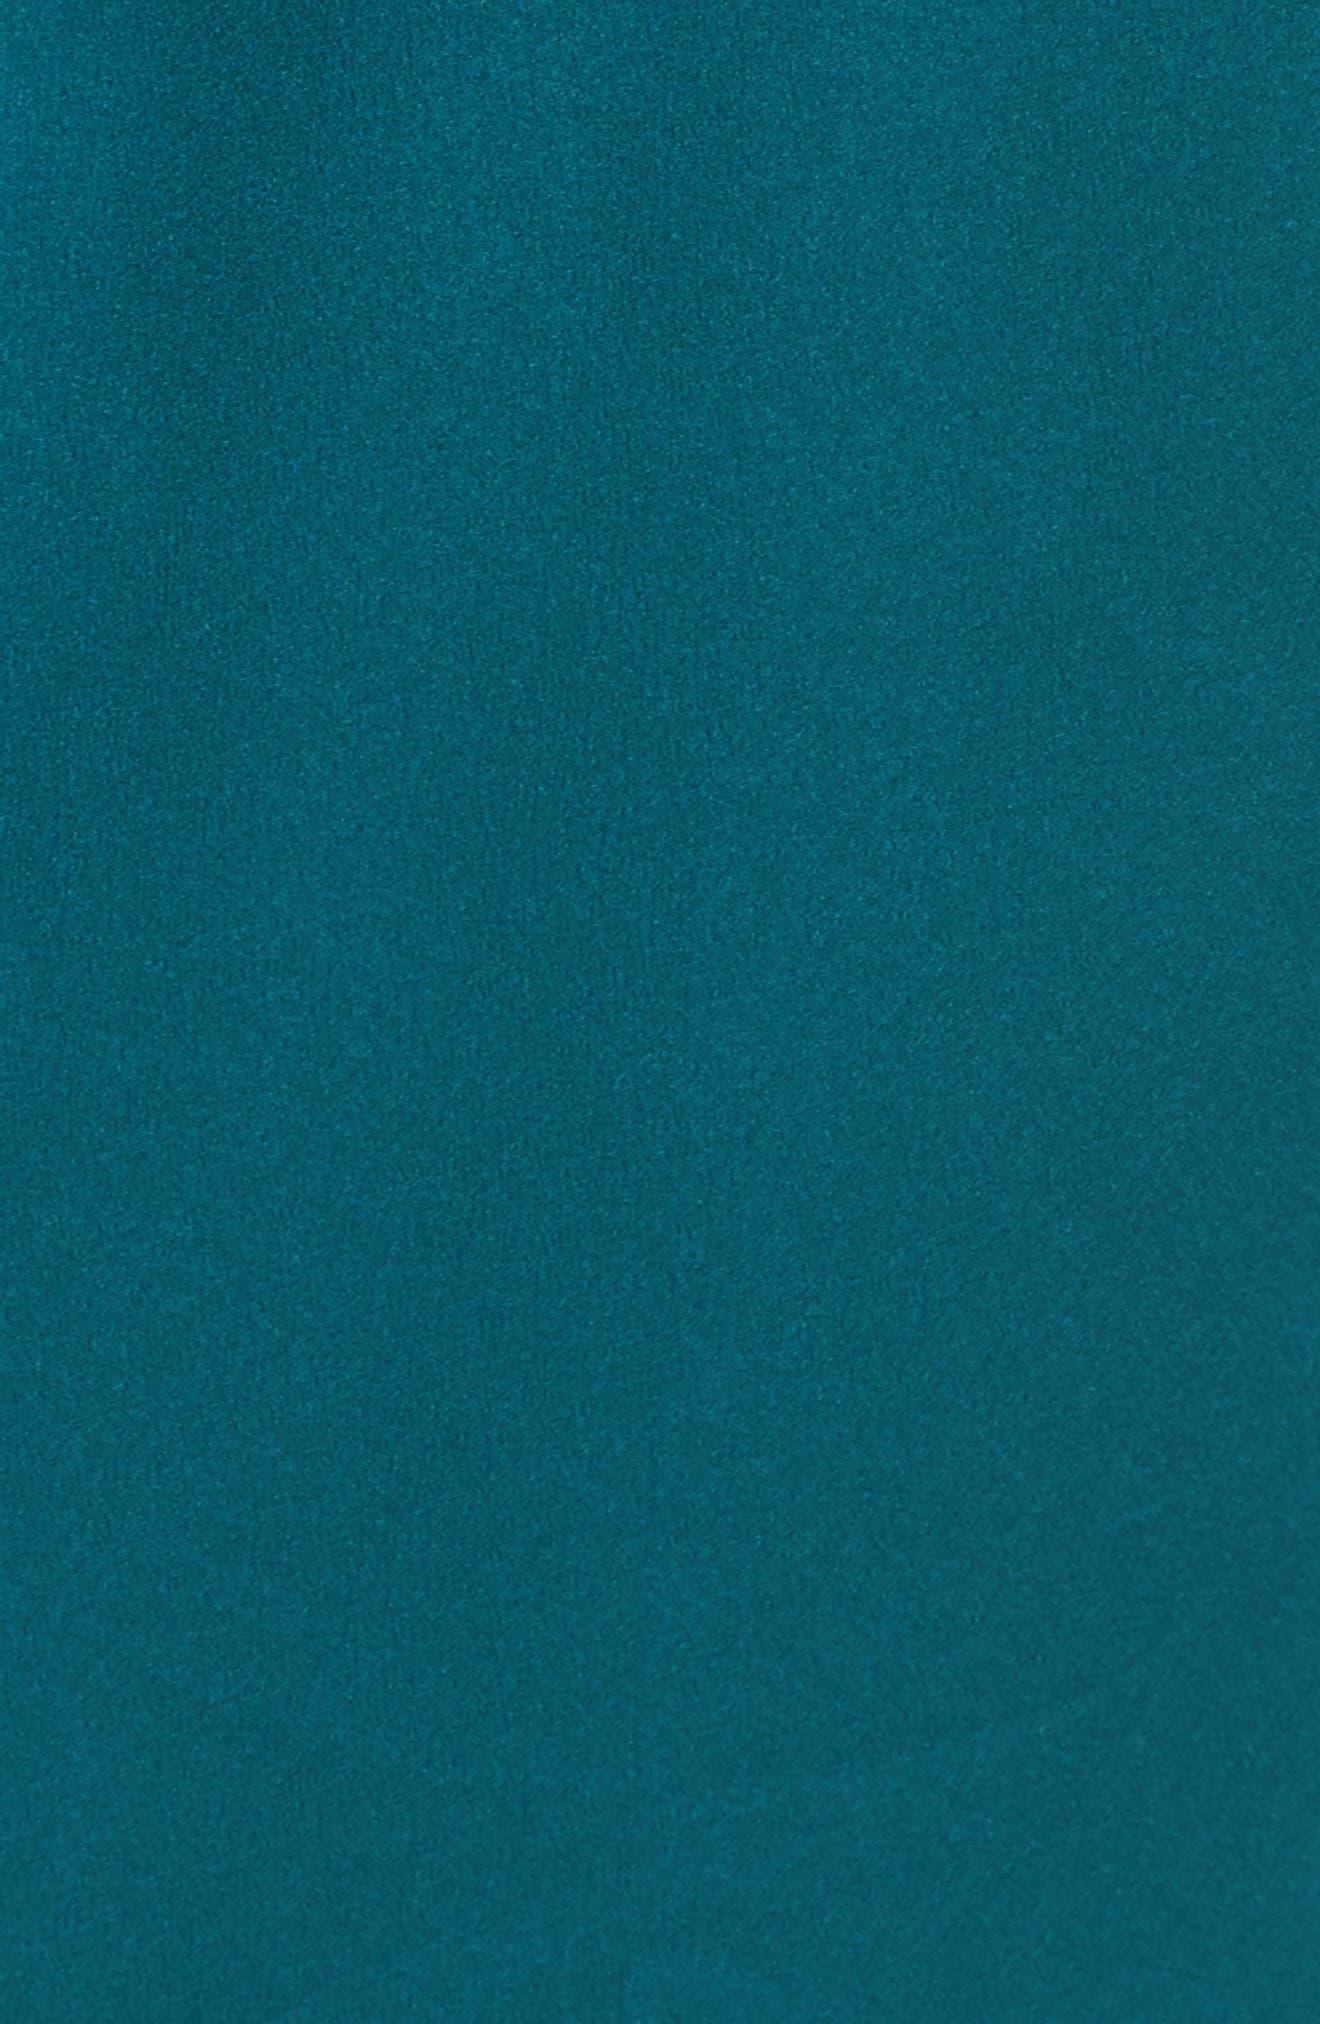 Feathers Satin Wrap,                             Alternate thumbnail 6, color,                             Blue Green